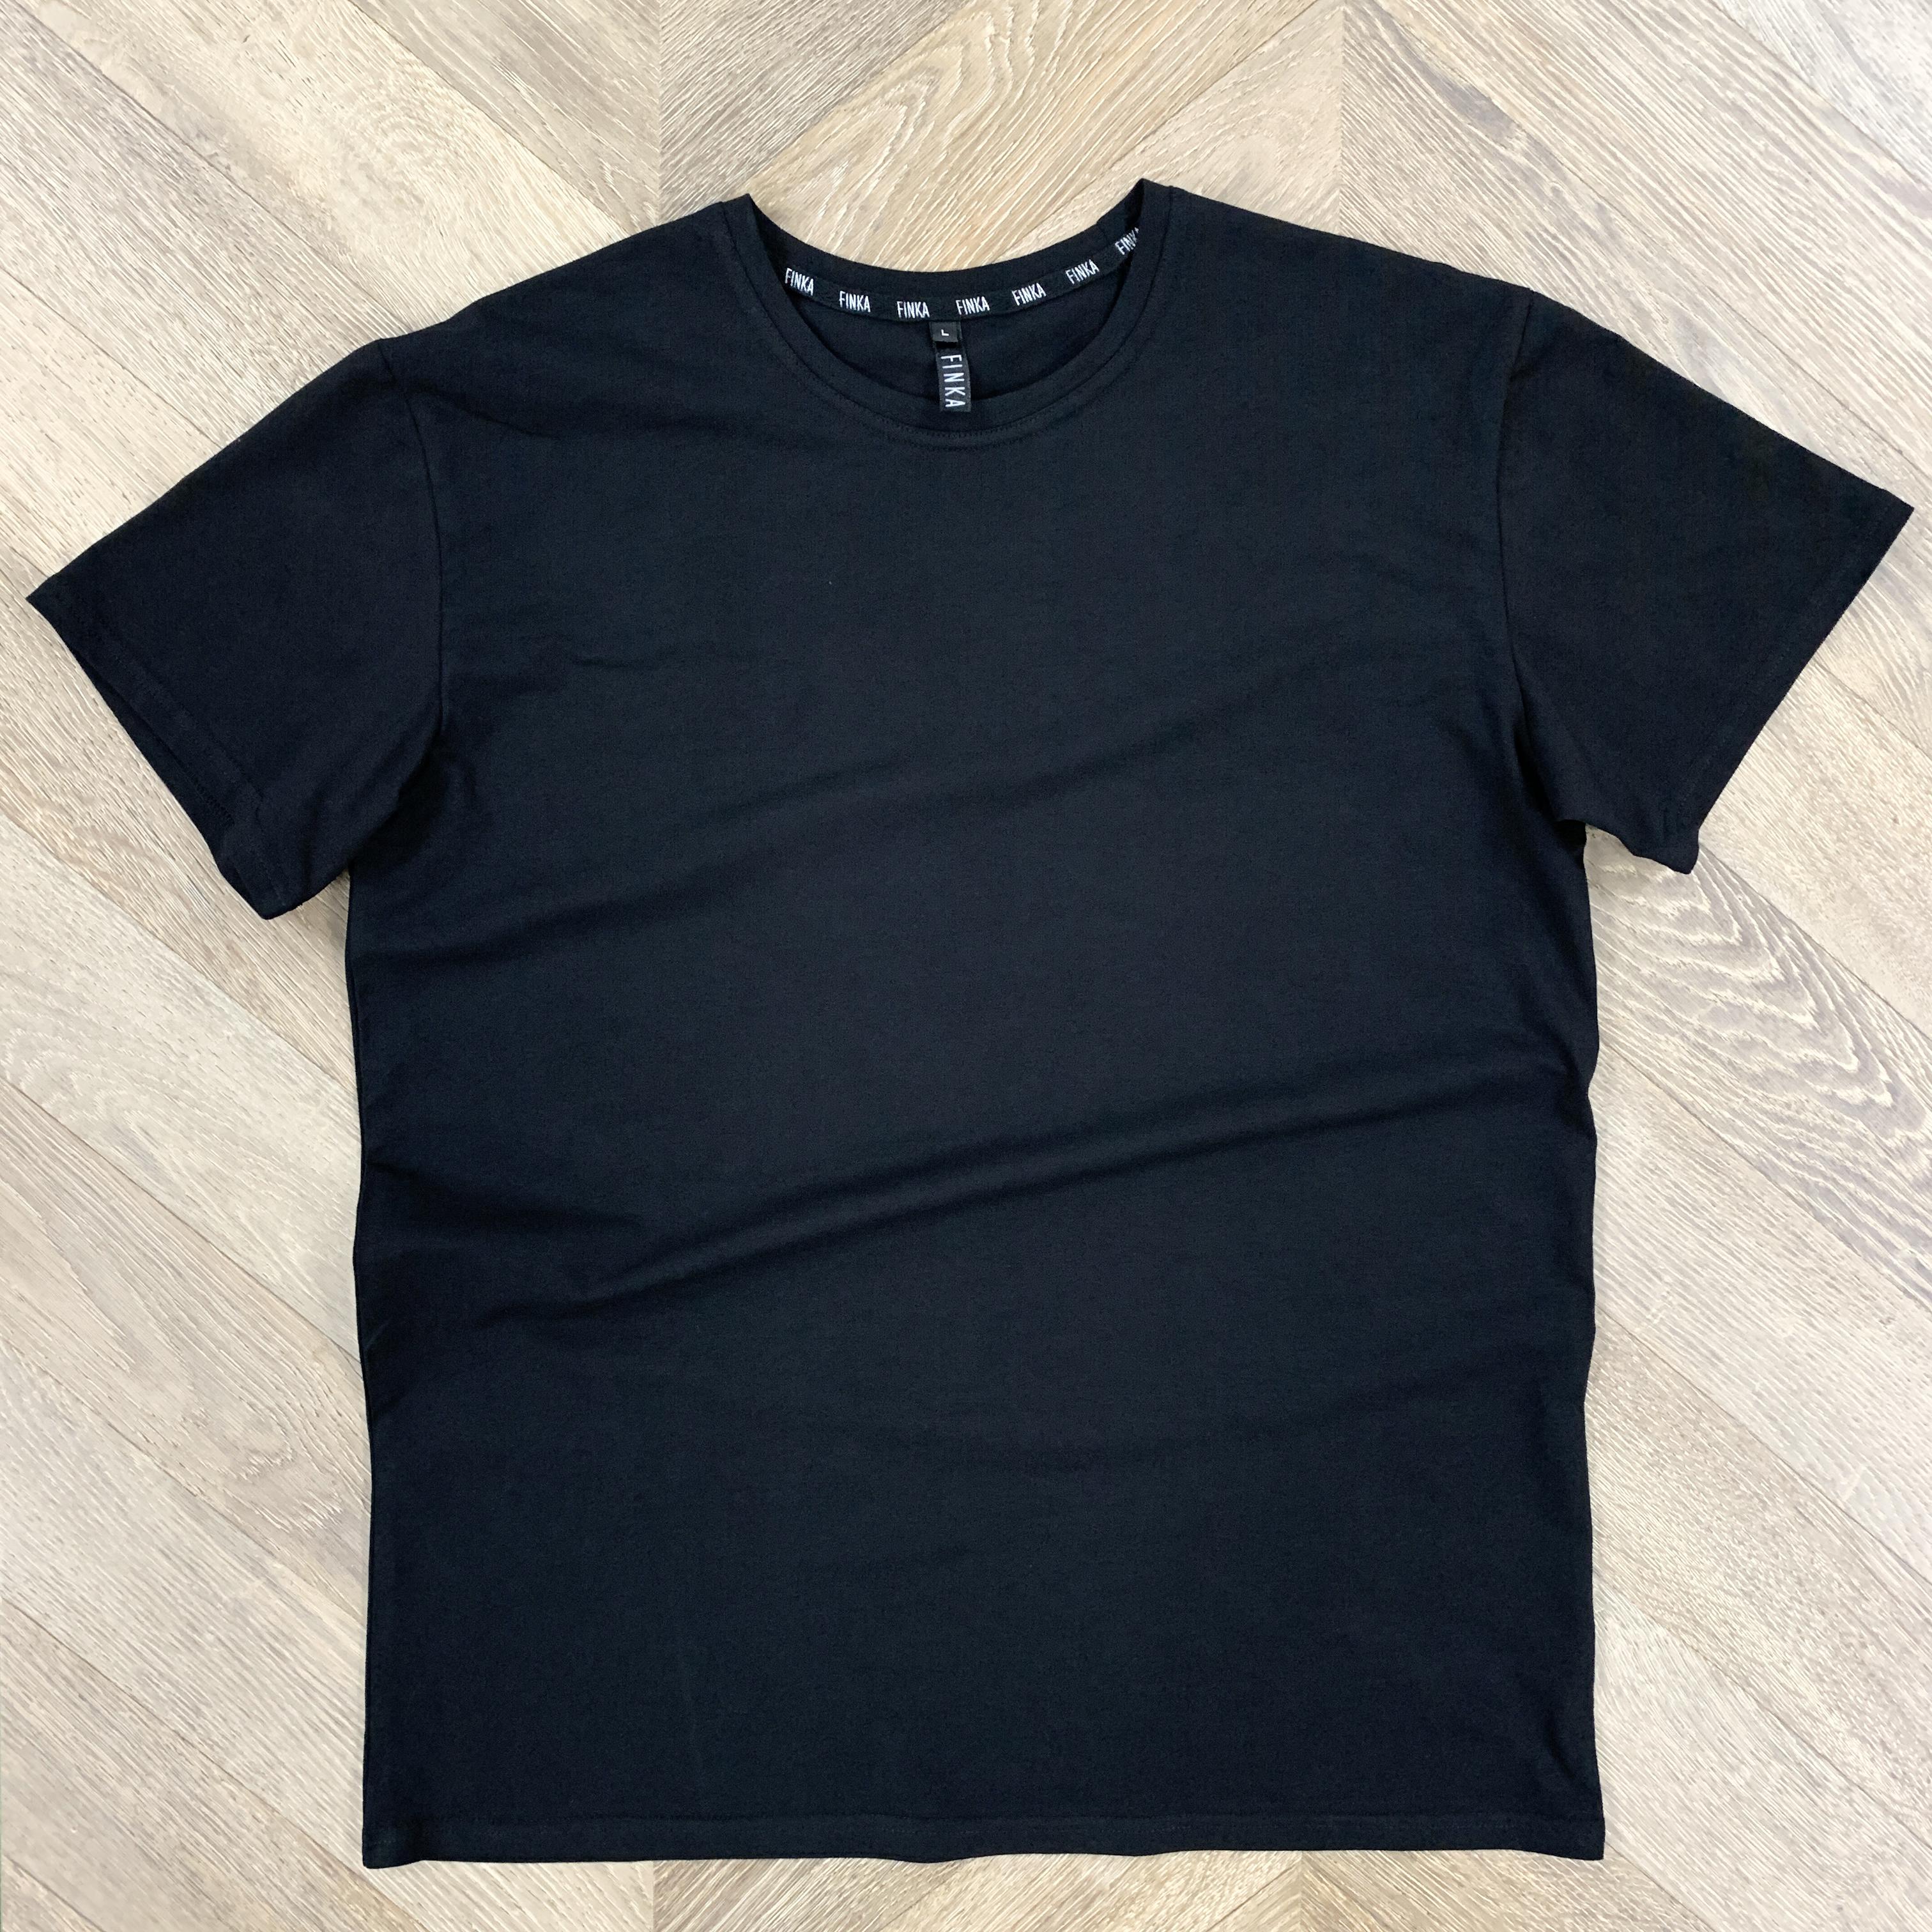 Мужская футболка (черная)